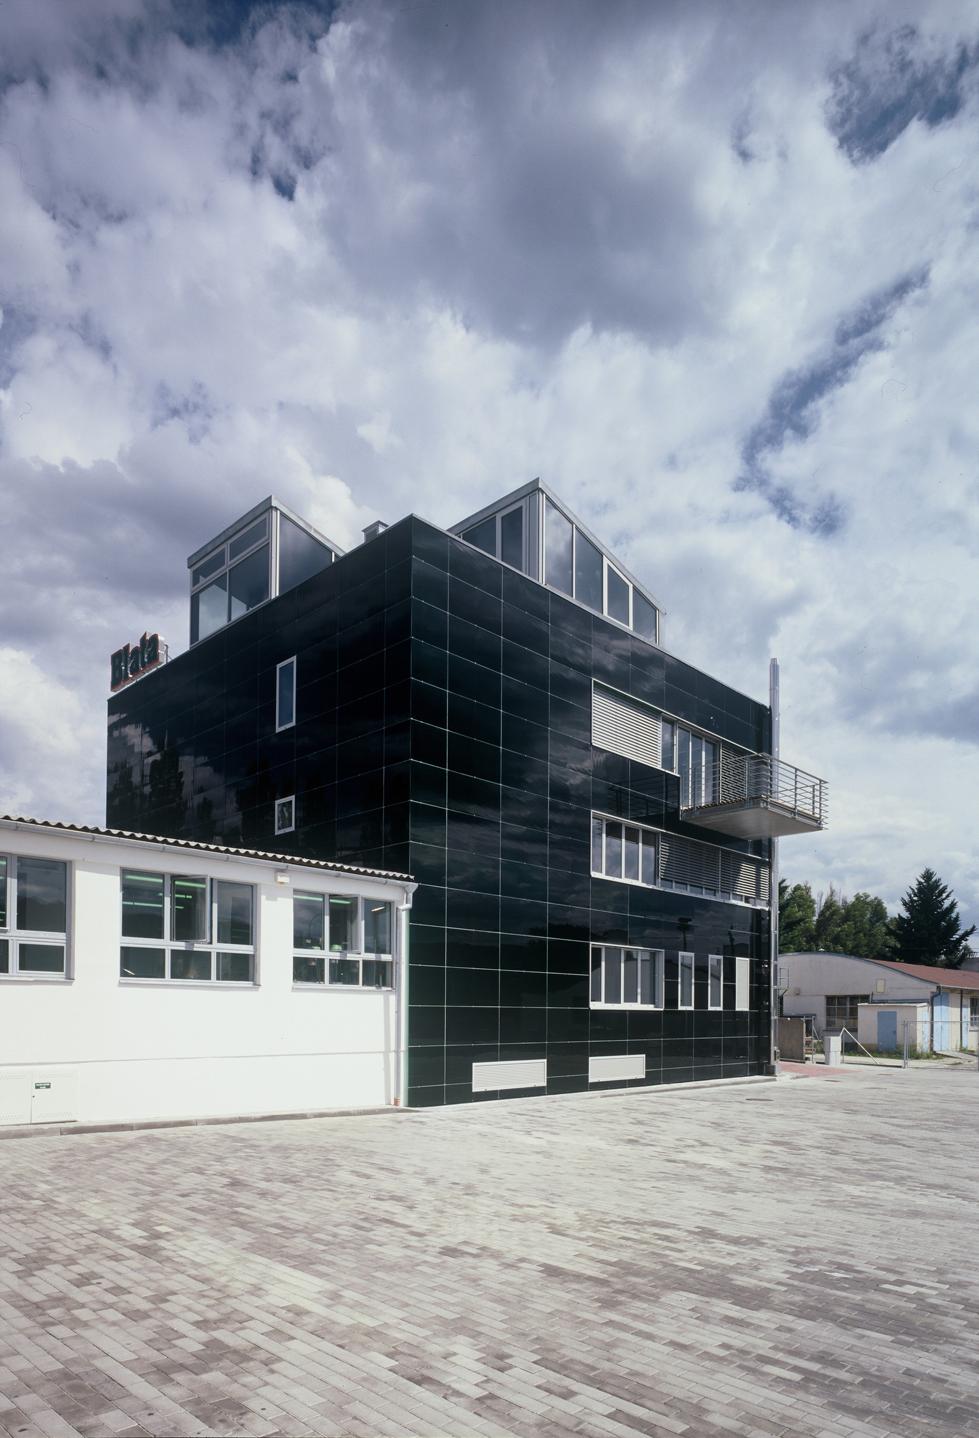 Administrativní budova Blata, Blansko